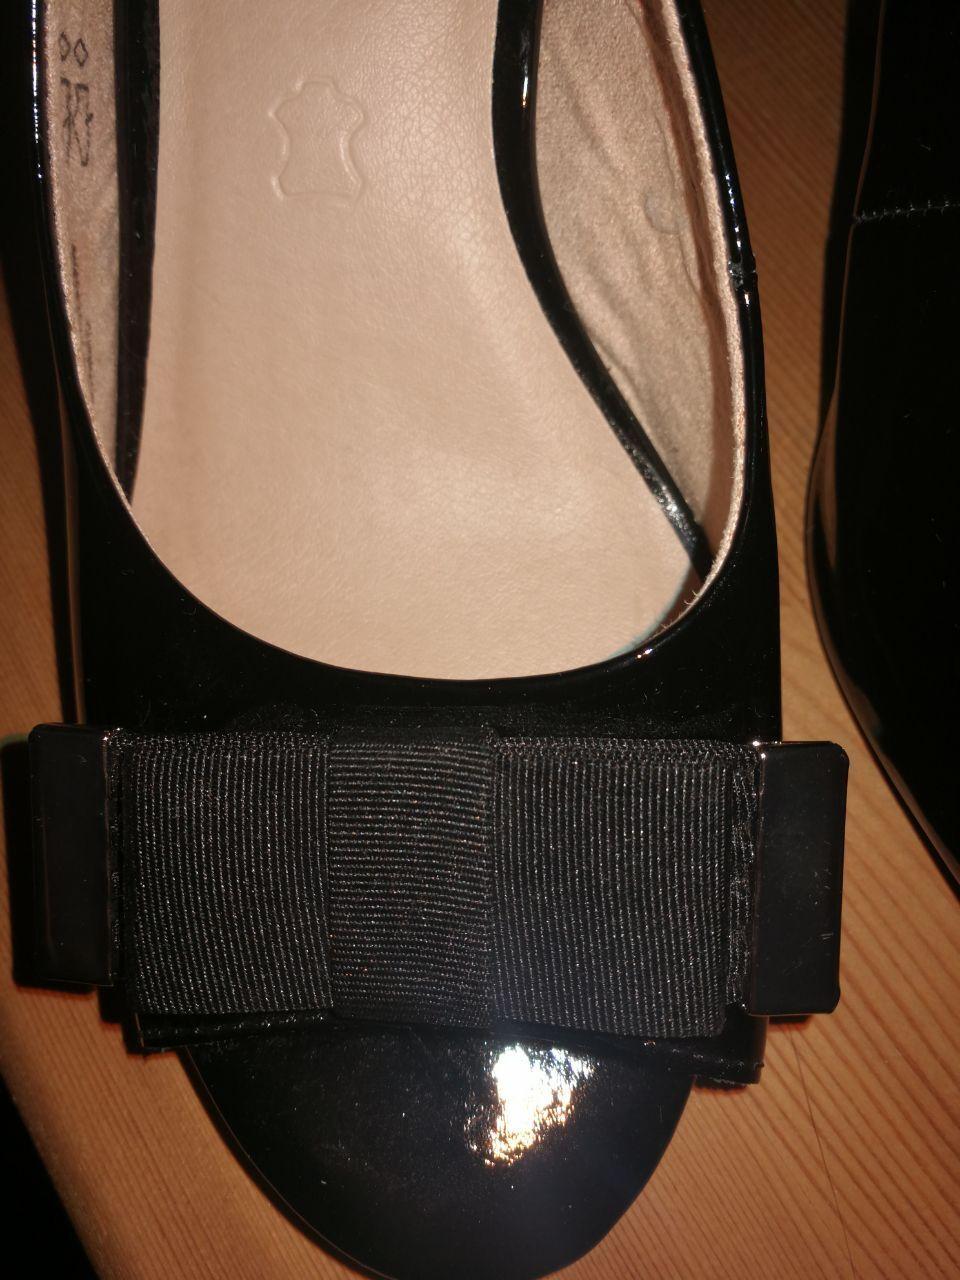 Caprice Sandalen - Damen Schuhe - Schwarz Lackleder Gr.37,5 NEU